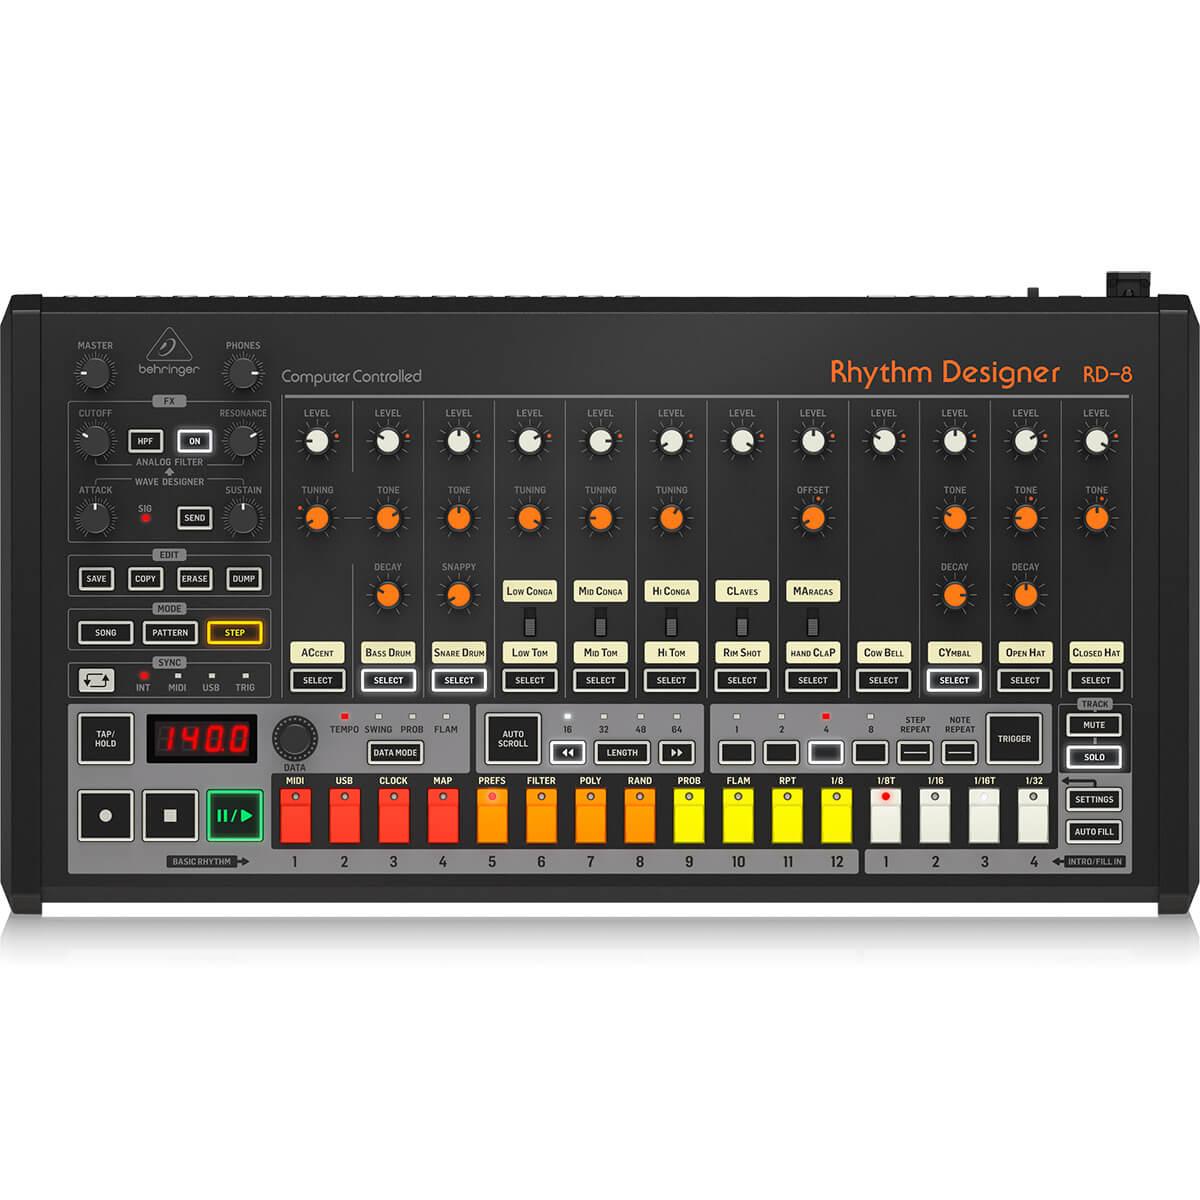 Sintetizador Analogico Behringer Rhythm Designer RD-8